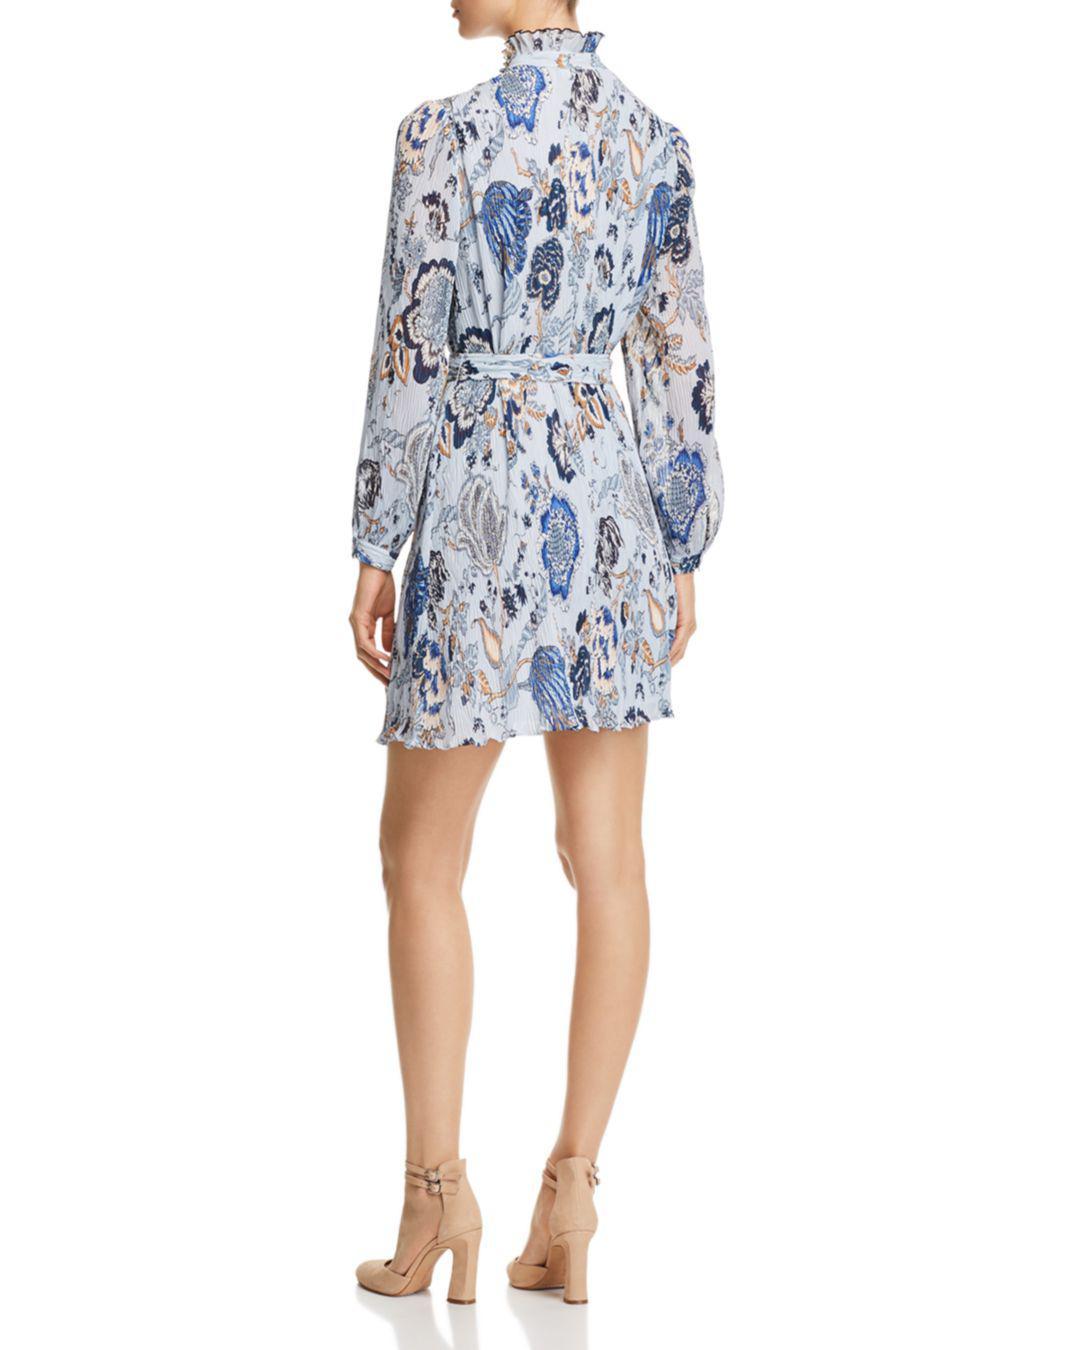 61a5b723d6 Lyst - Tory Burch Deneuve Dress in Blue - Save 50%